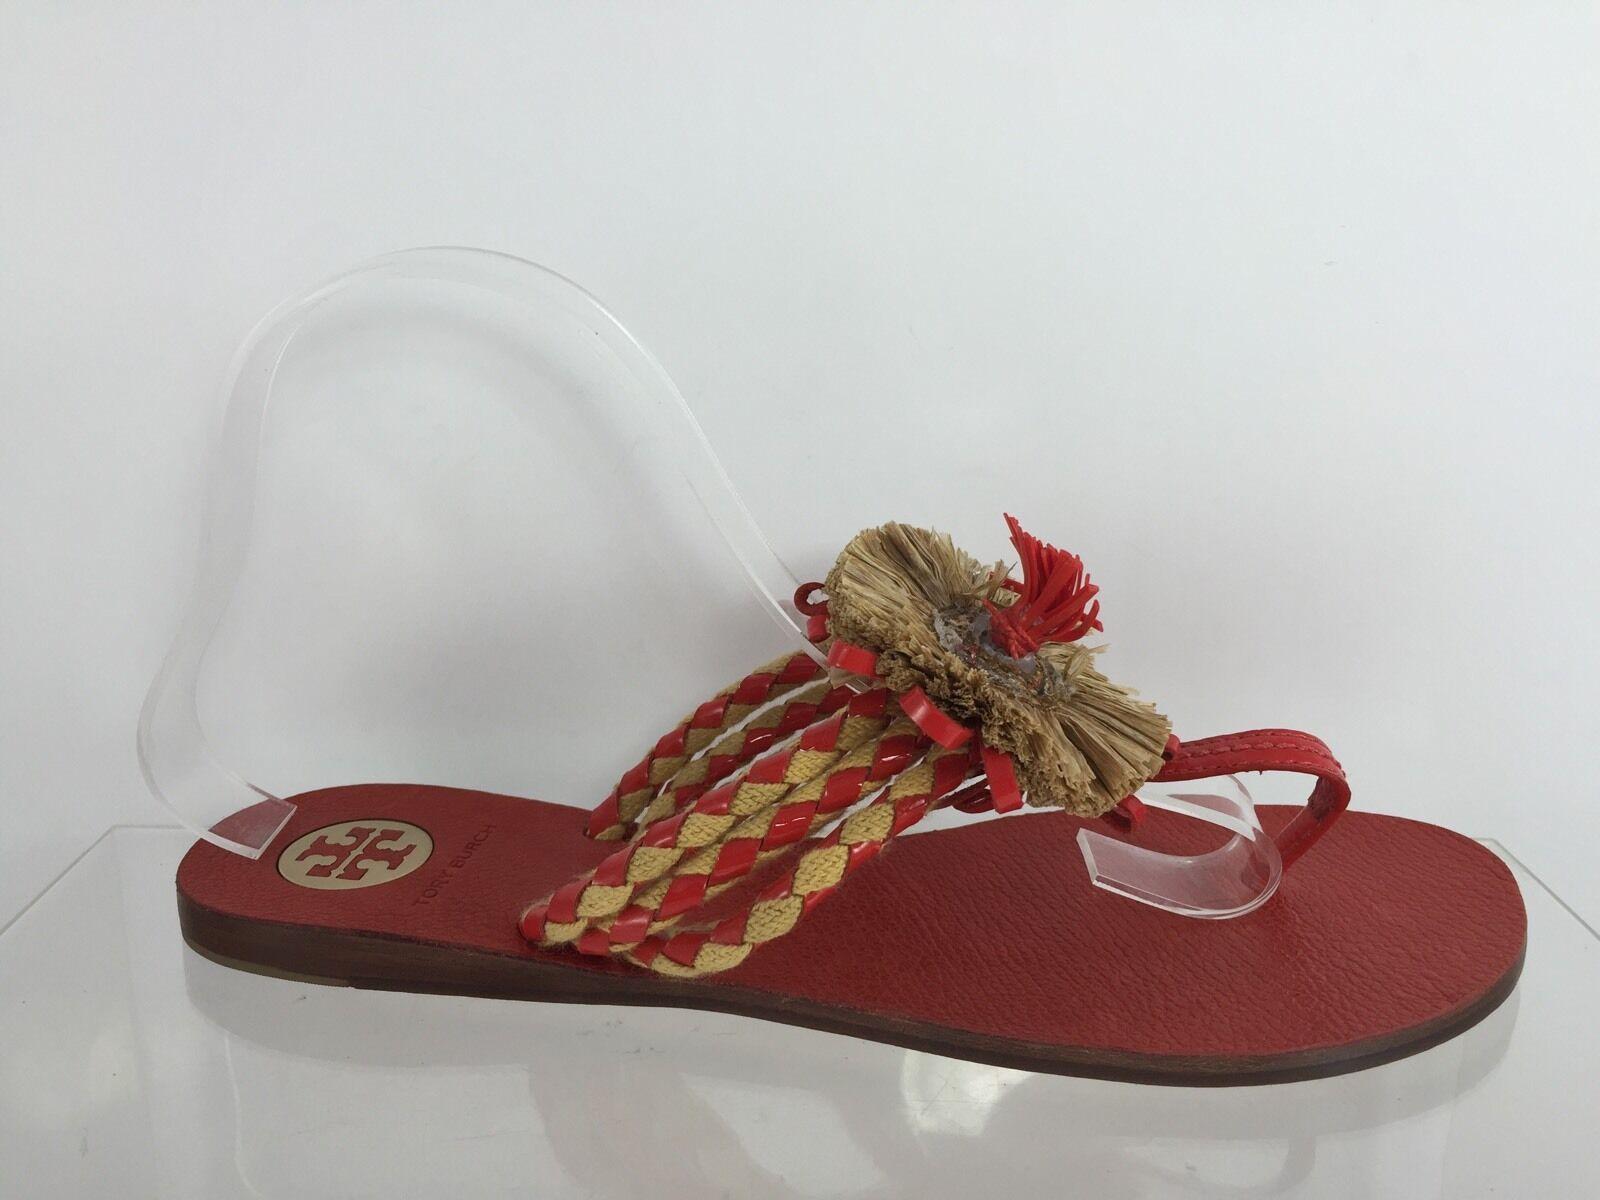 Tory Burch Donna Red Flip Flops 10 M